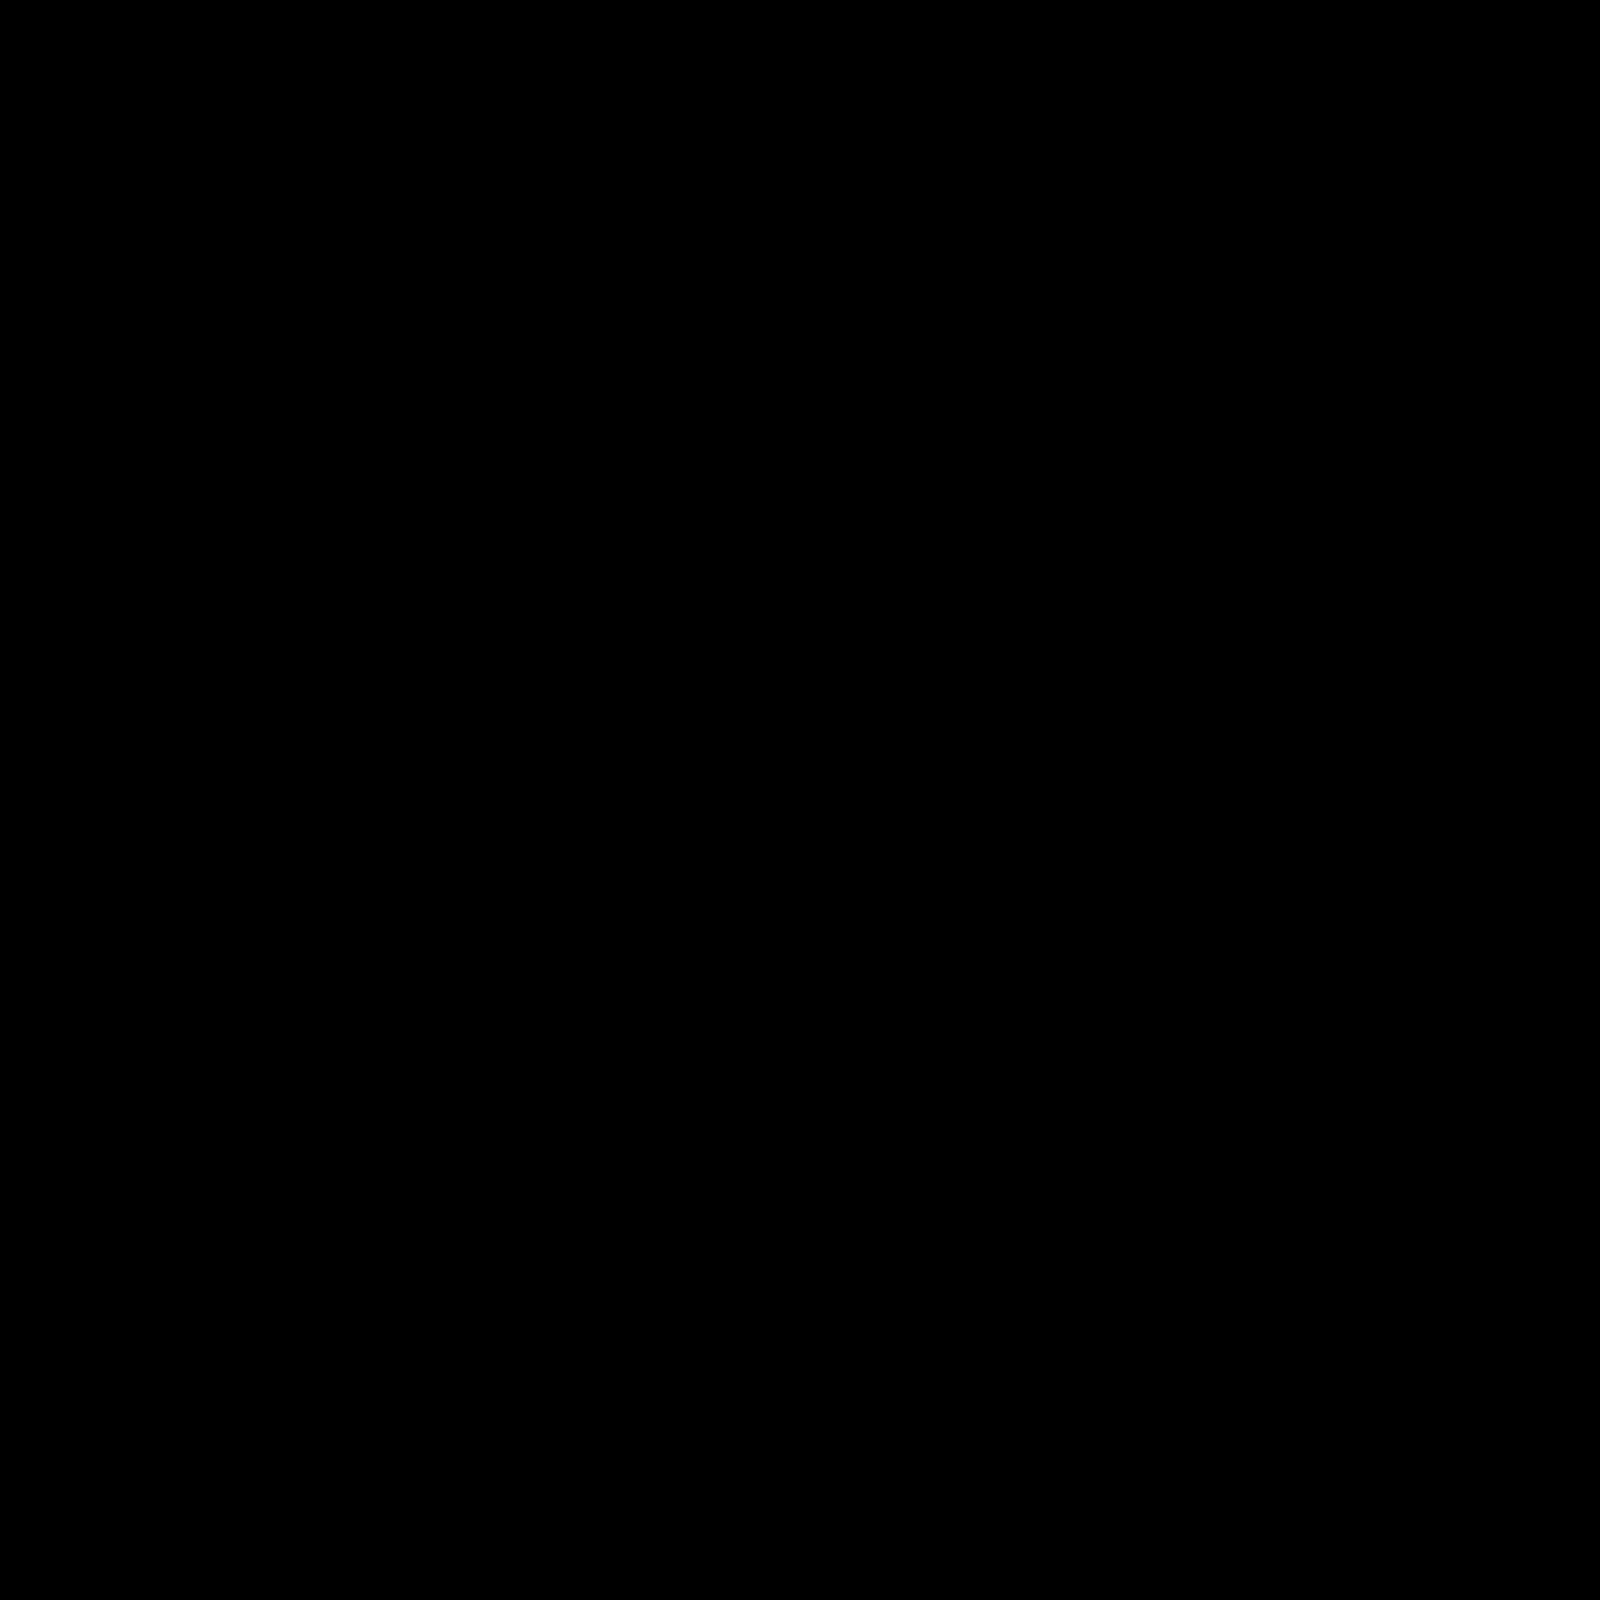 Hashtag Key Filled icon